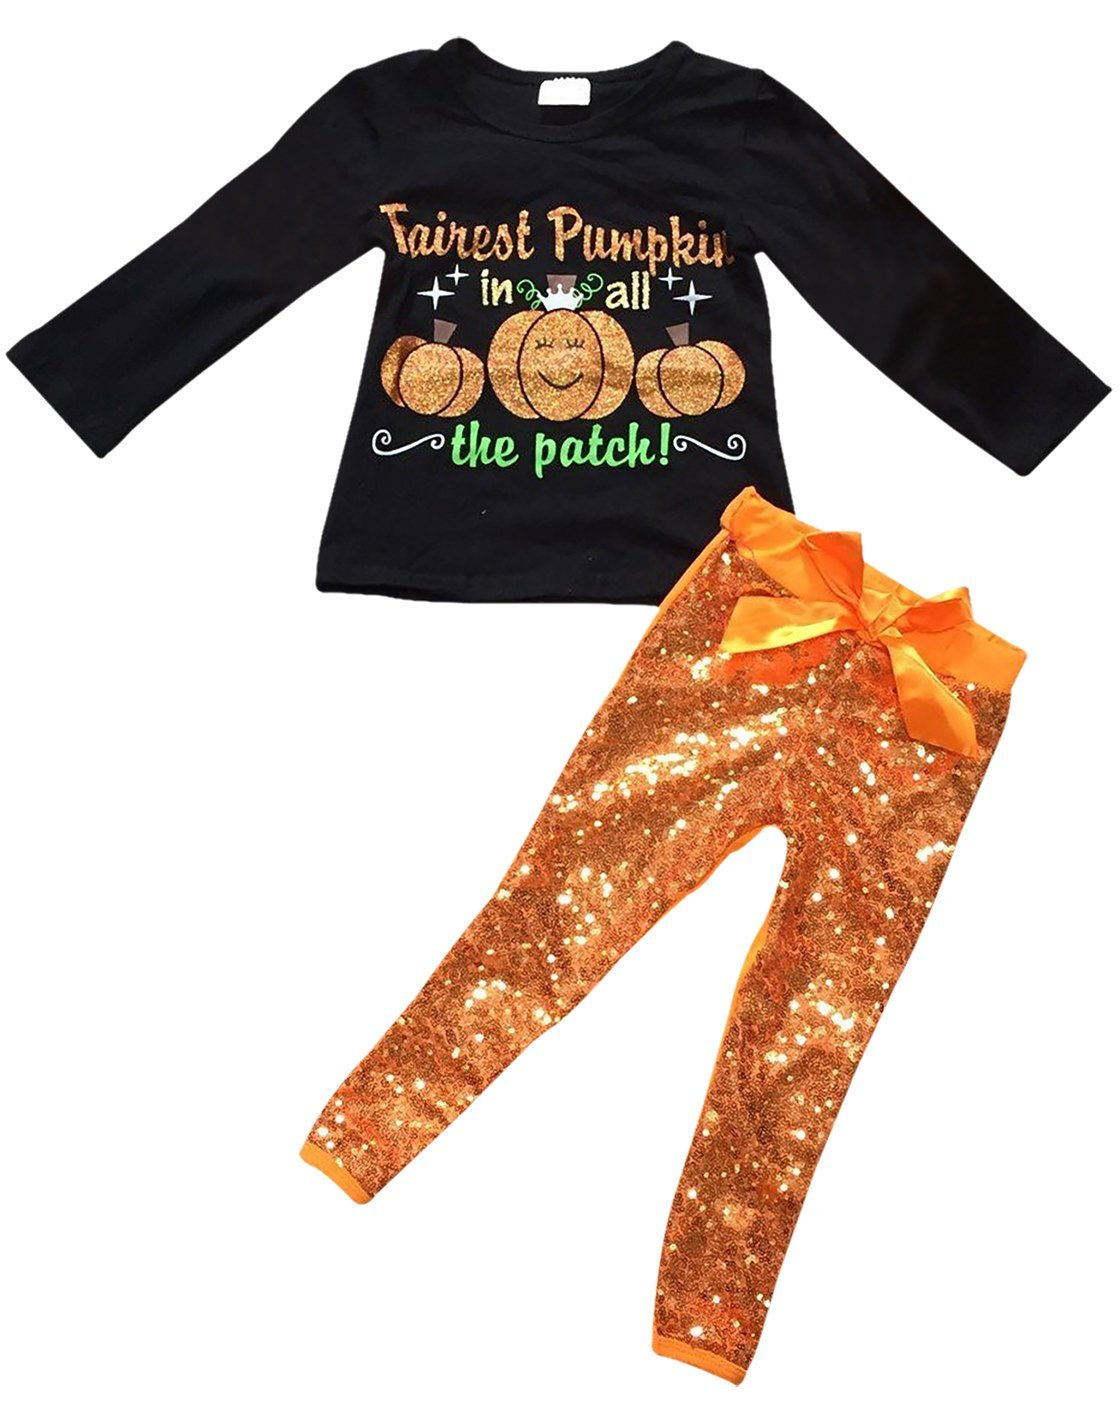 Little Girls' 2 Pieces Pant Set Halloween Pumpkin T-Shirt Top Sequin Kids Outfit Black 4 M (P501670P)